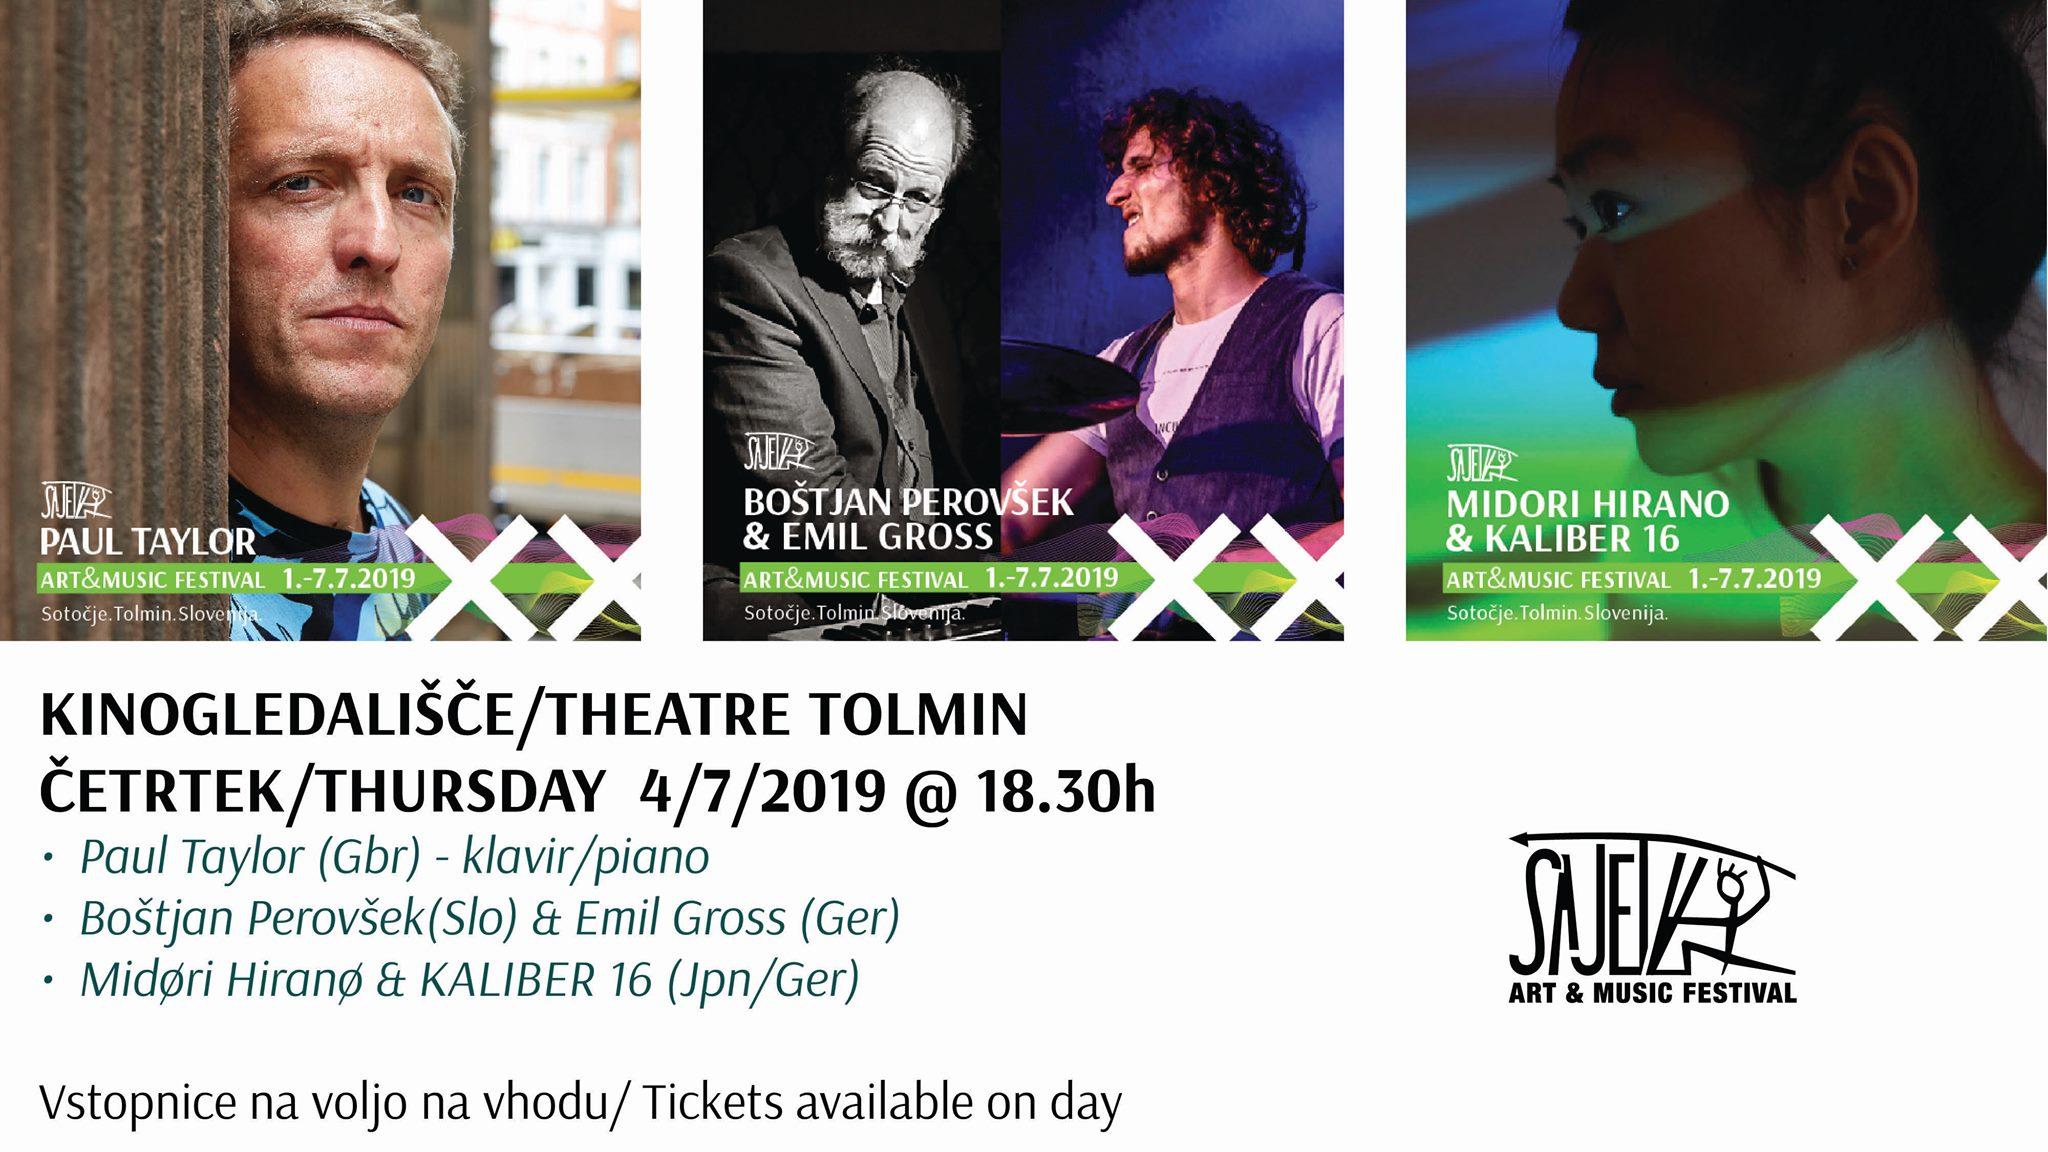 PAUL TAYLOR, BOŠTJAN PEROVŠEK, MIDORI HIRANO (Sajeta 2019, koncerti)